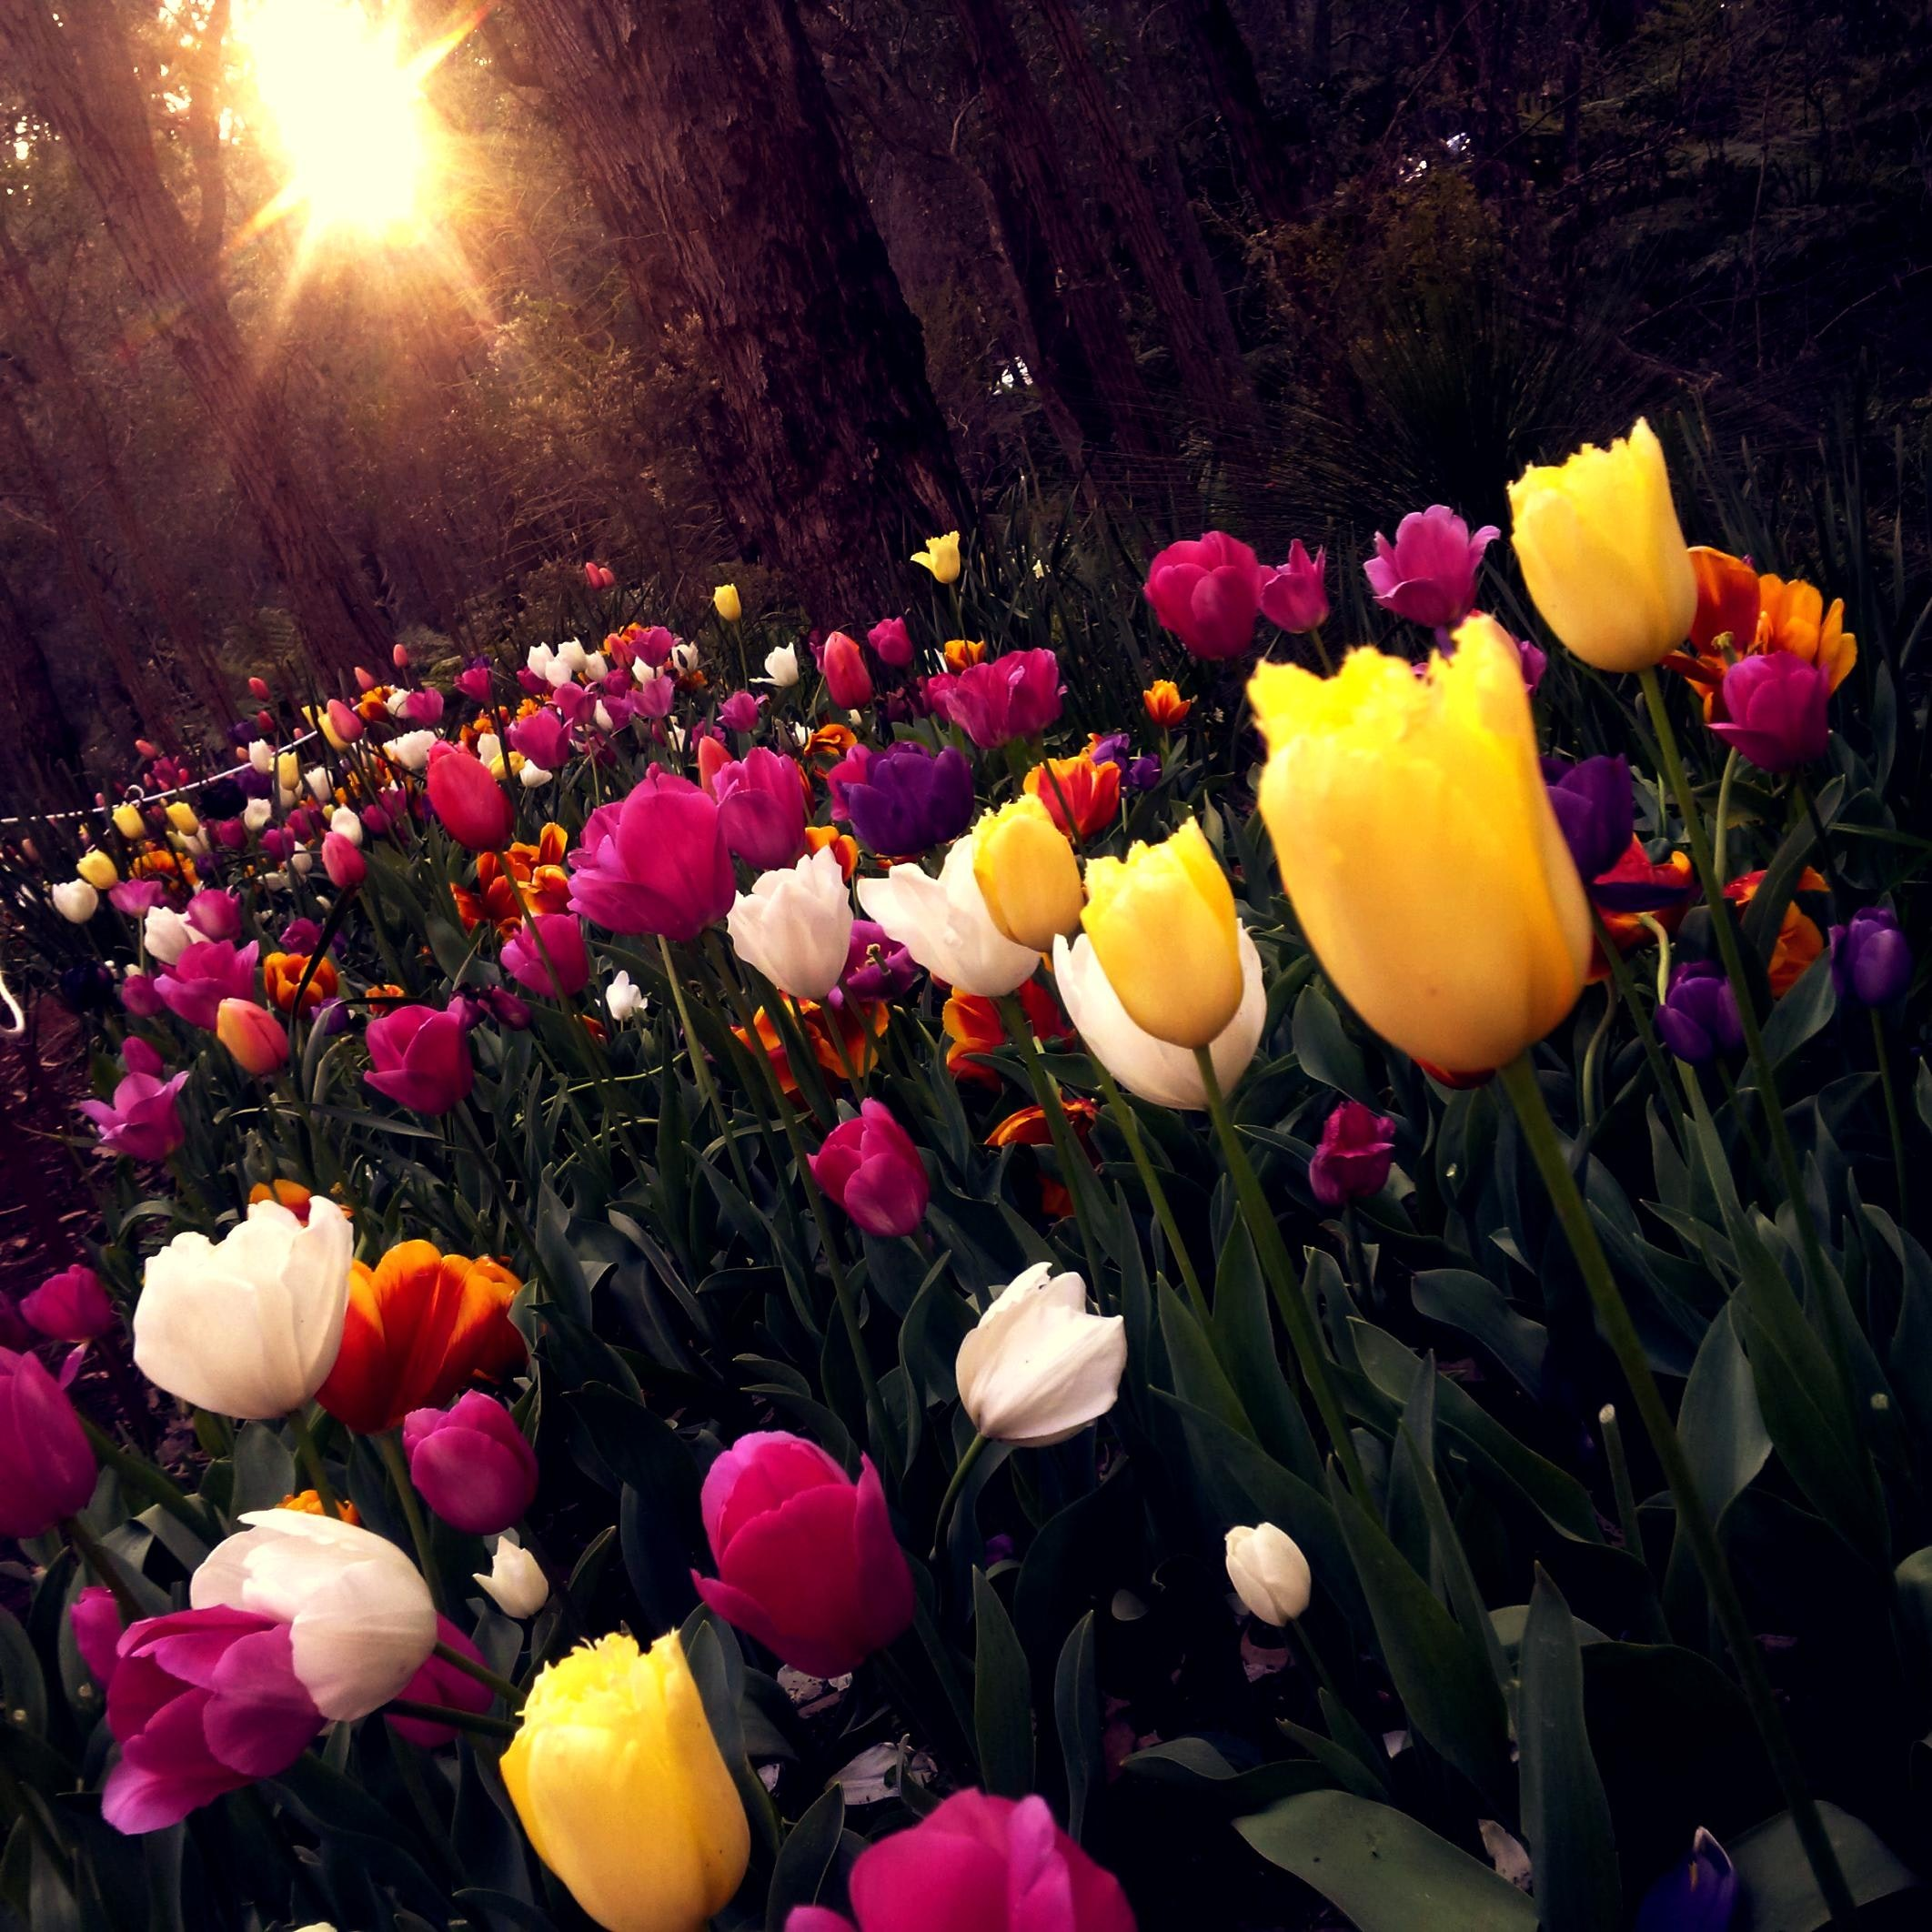 1000 beautiful beautiful flowers photos pexels free stock photos fetching more photos izmirmasajfo